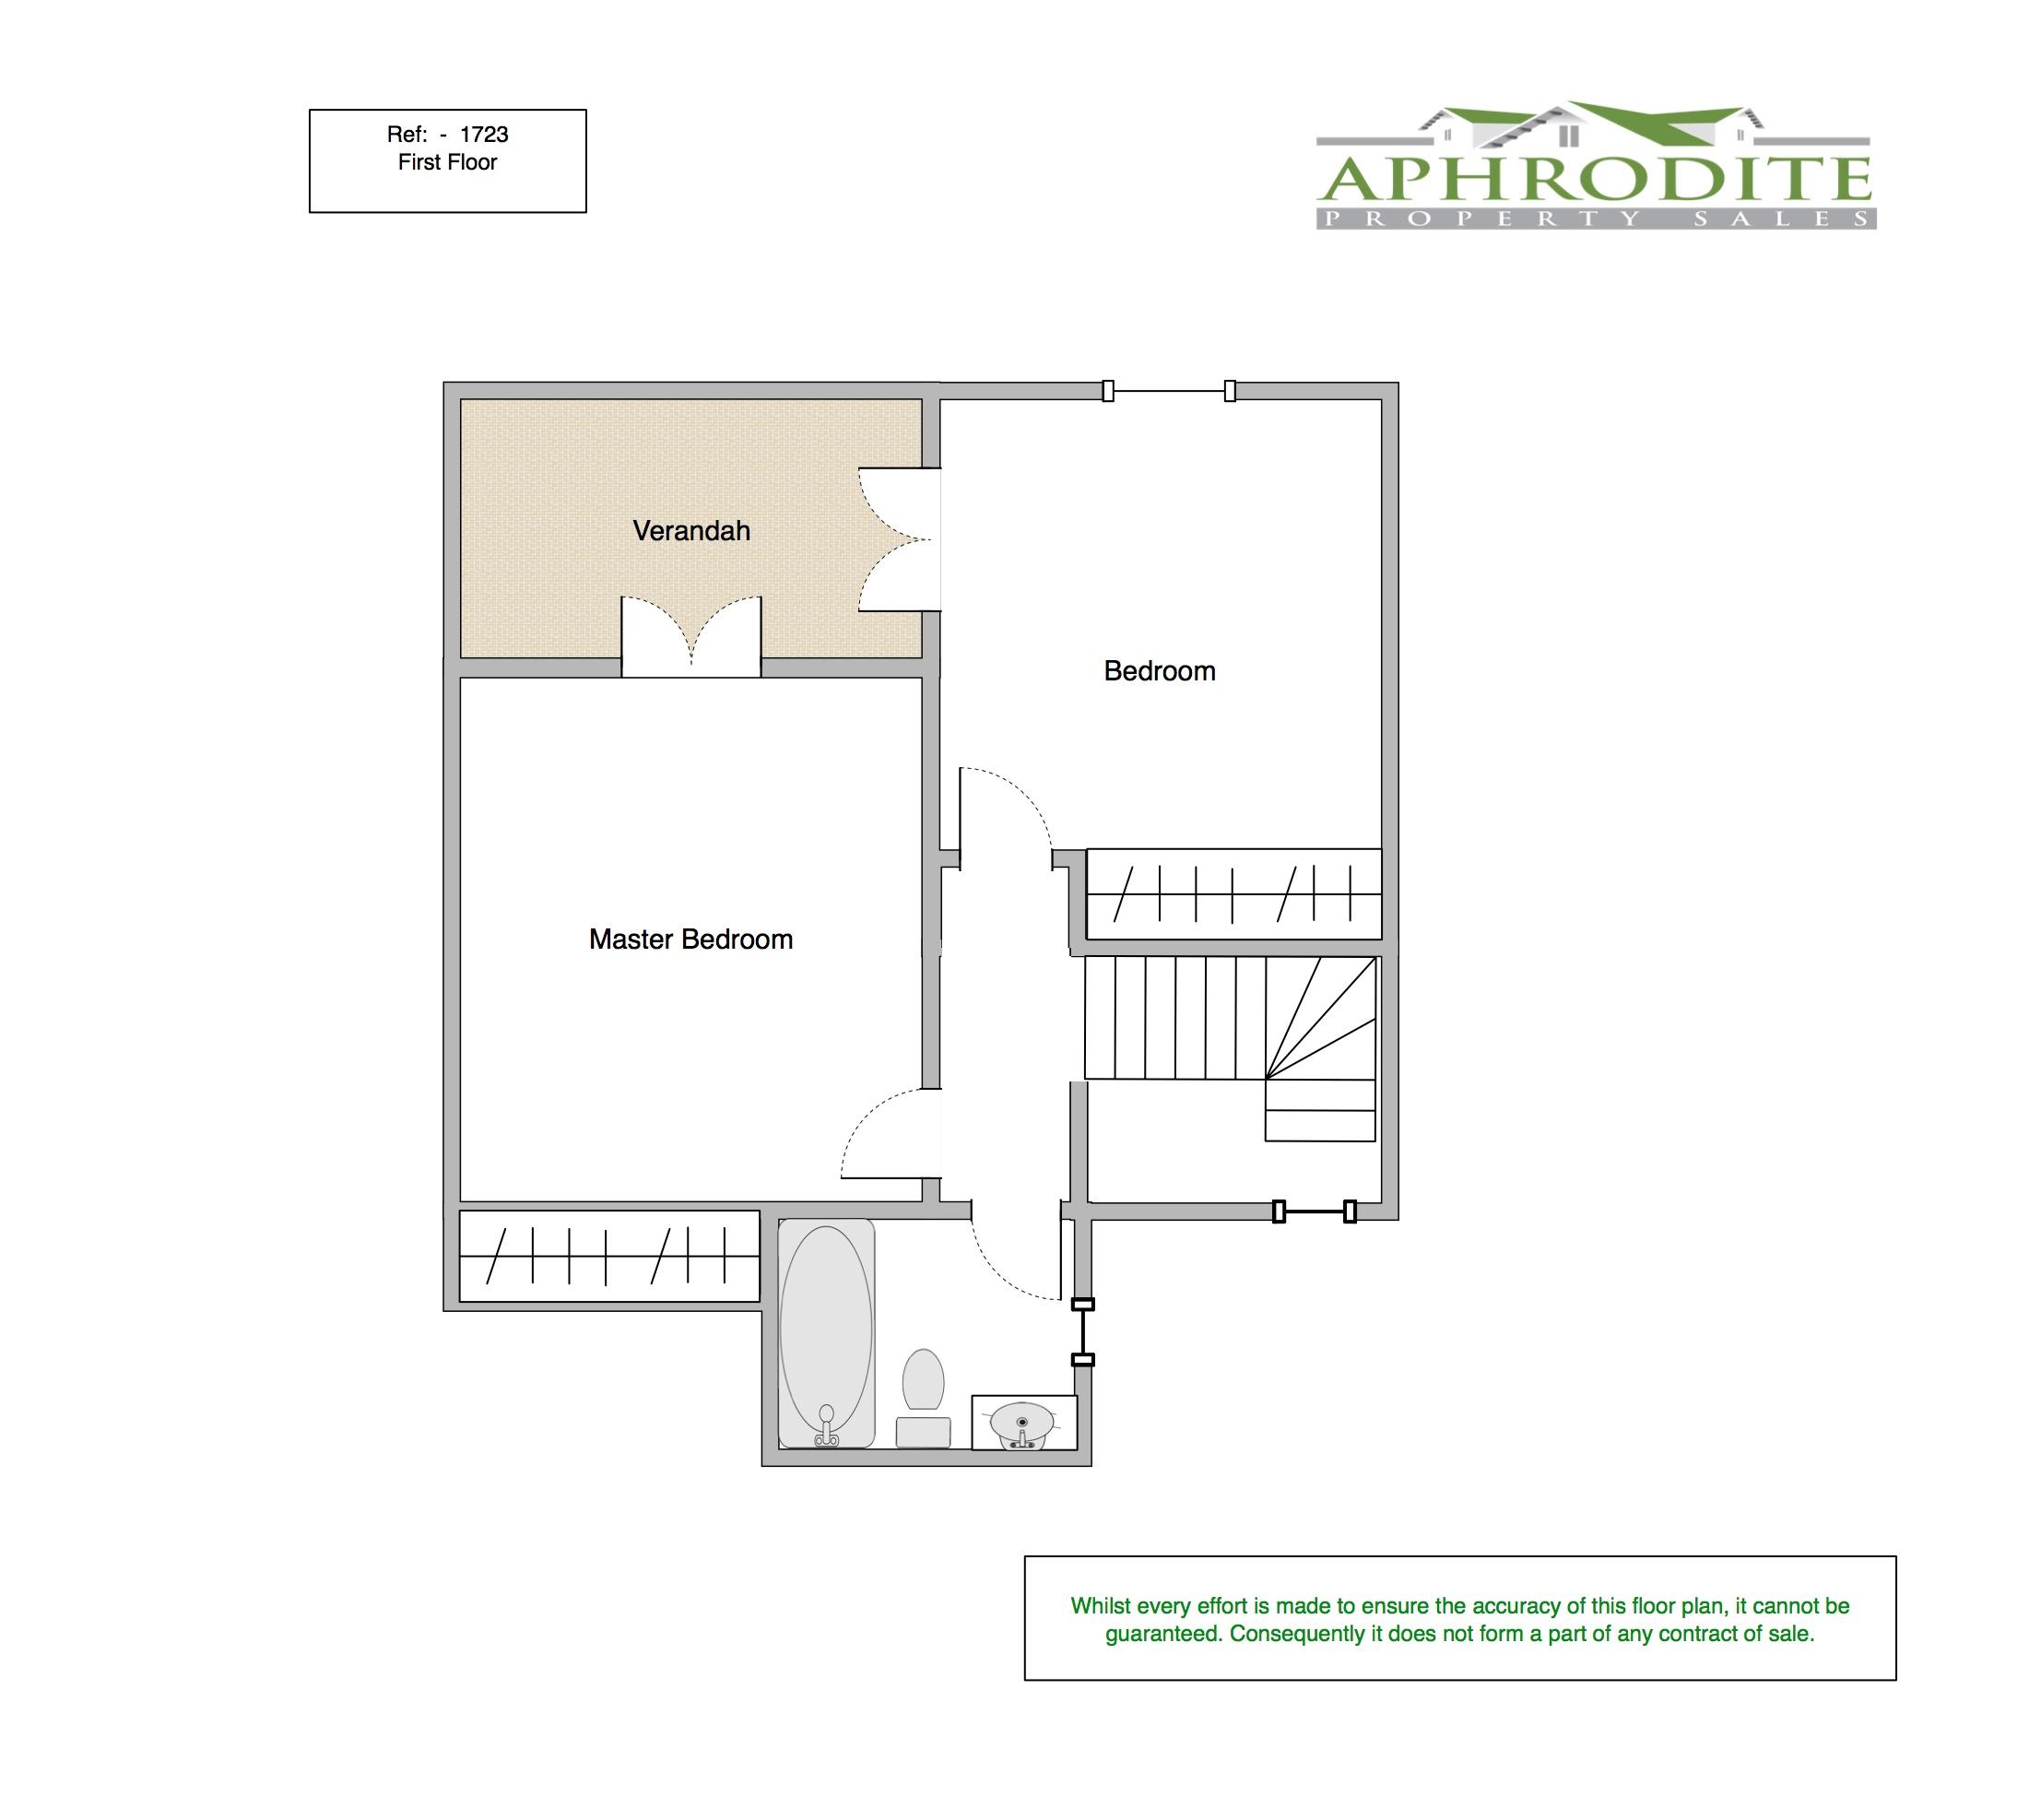 1723 - 2 Bedroom Junior Villa - Adonis Village - Aphrodite Hills floorplan 2